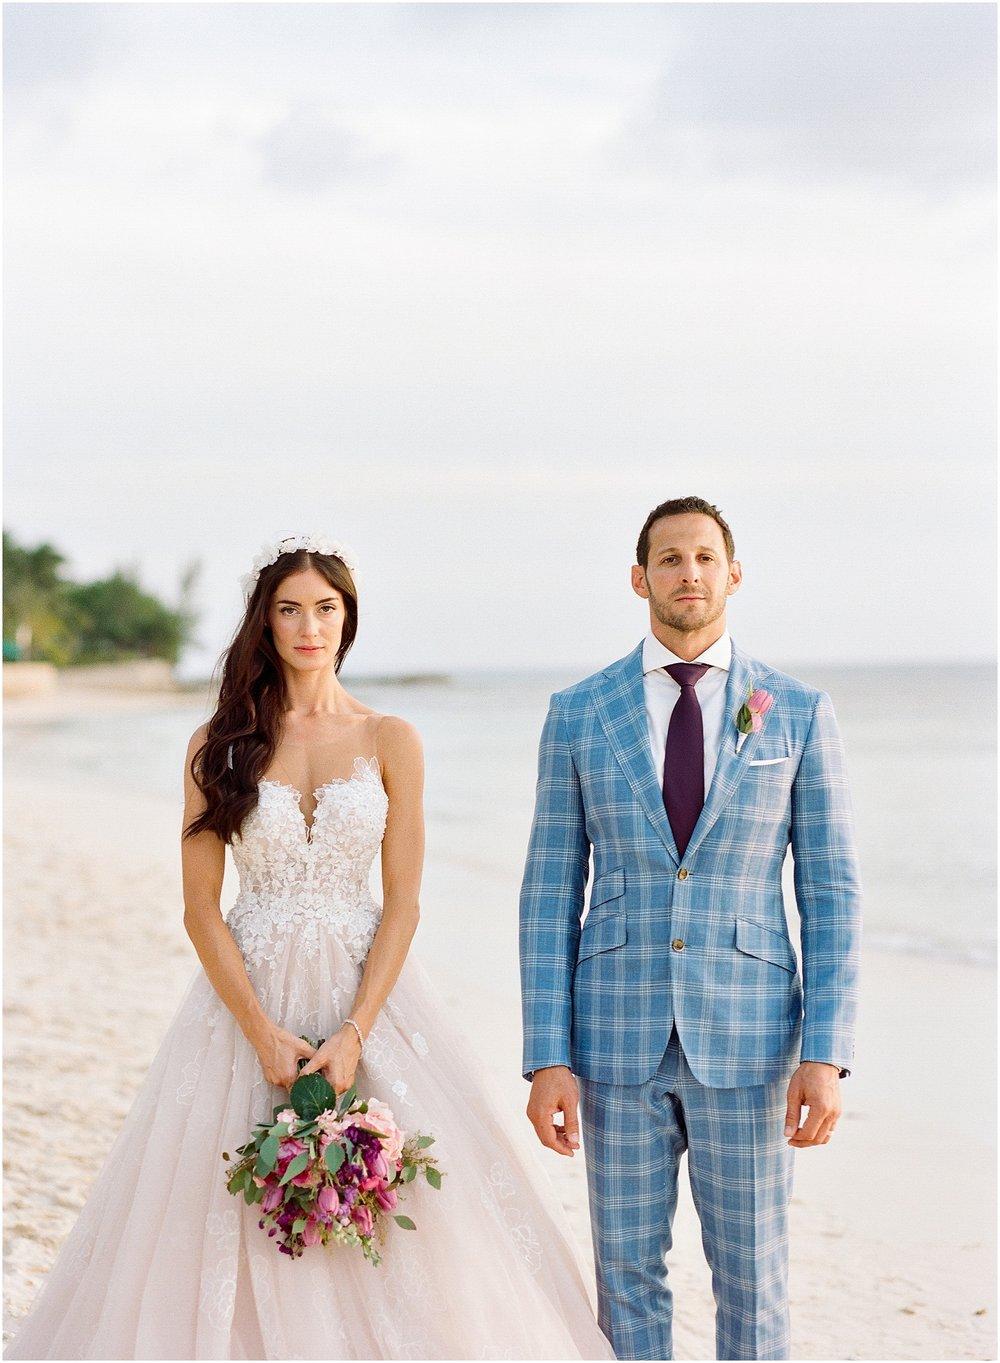 Marriott Grand Cayman Destination Wedding by Flora + Fauna 0029.jpg